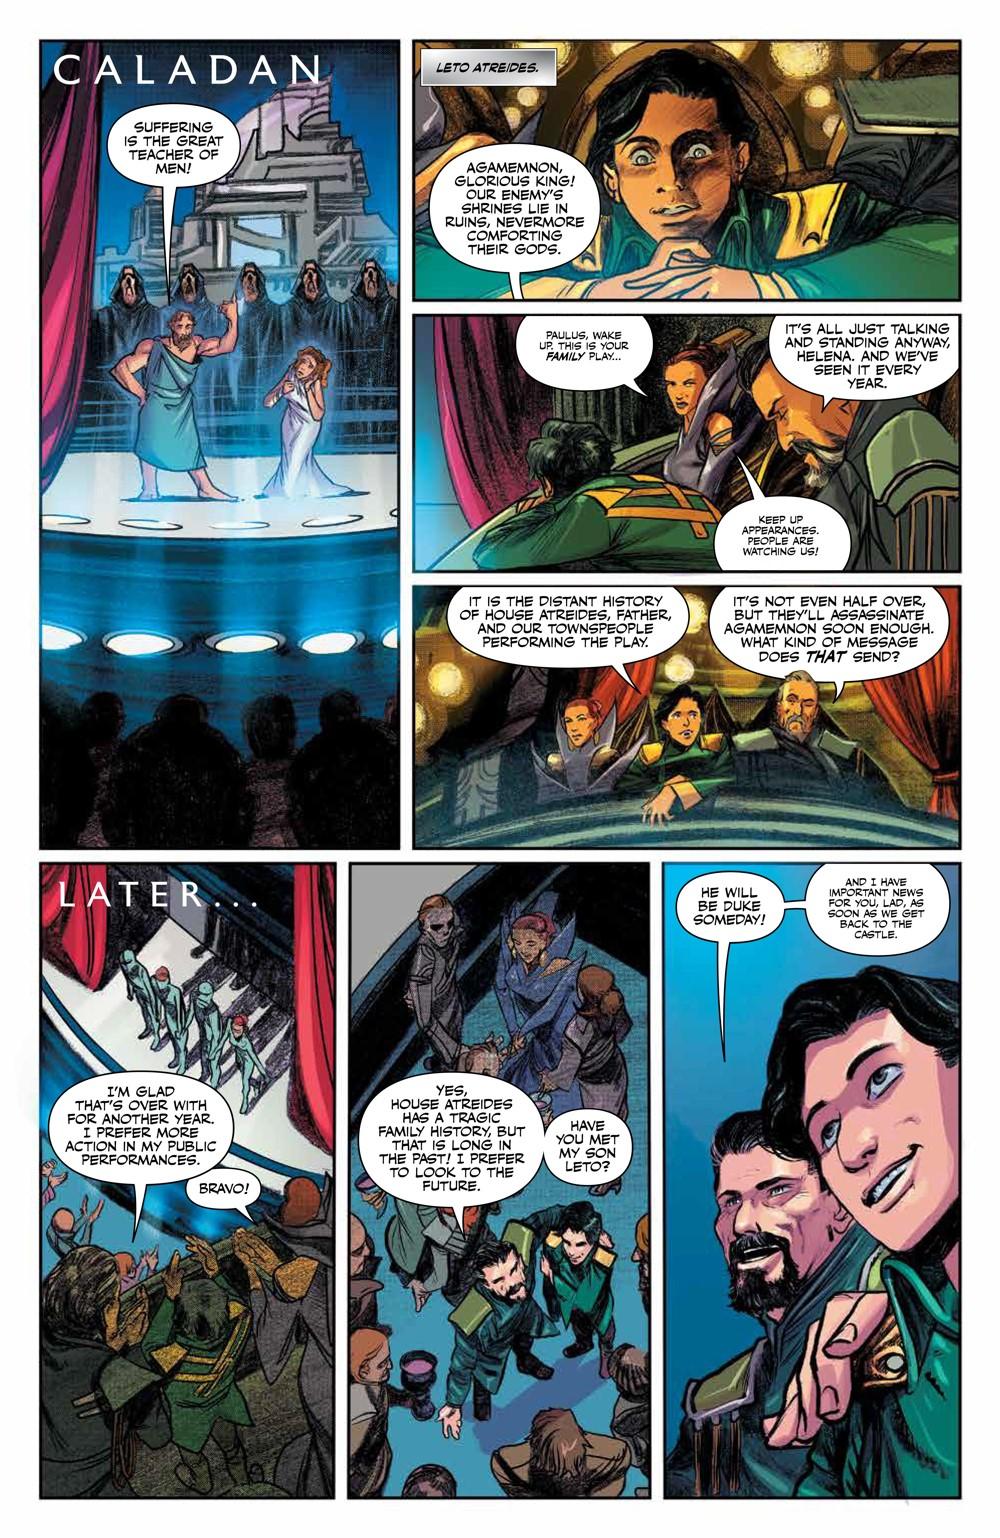 Dune_HouseAtreides_v1_HC_PRESS_19 ComicList Previews: DUNE HOUSE ATREIDES VOLUME 1 HC